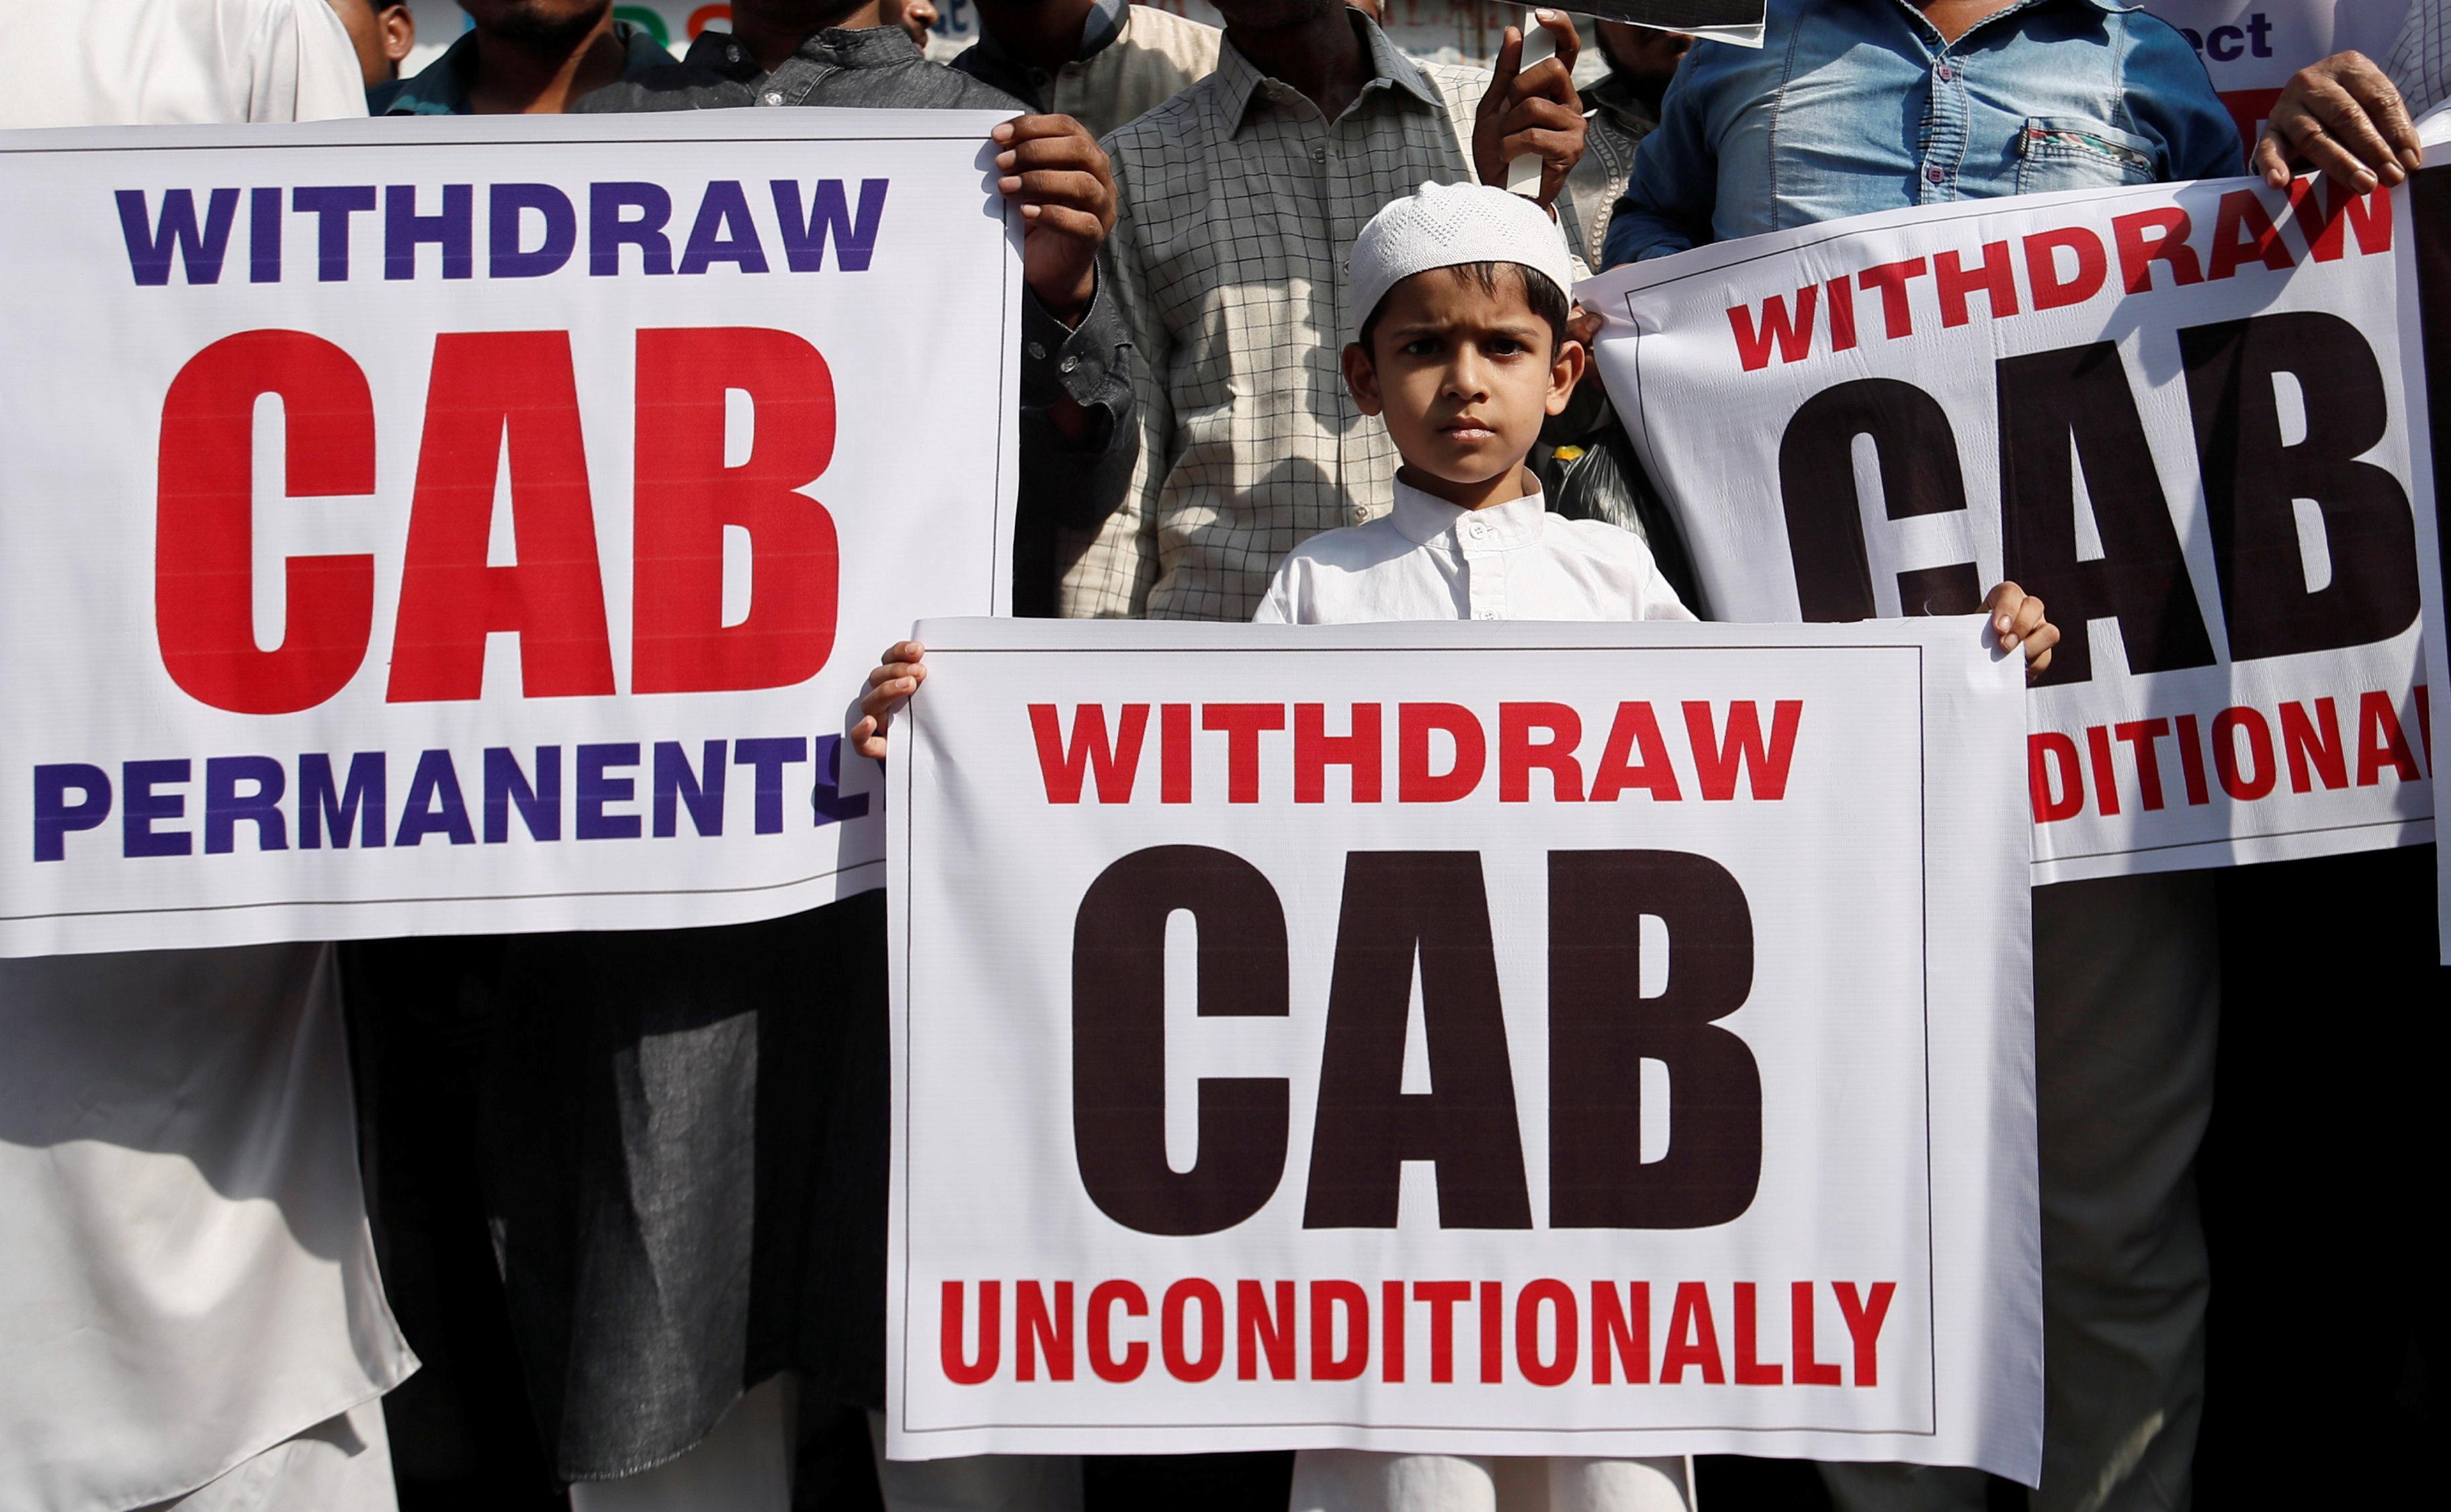 Clashes erupt in Delhi over citizenship law; PM Abe cancels visit